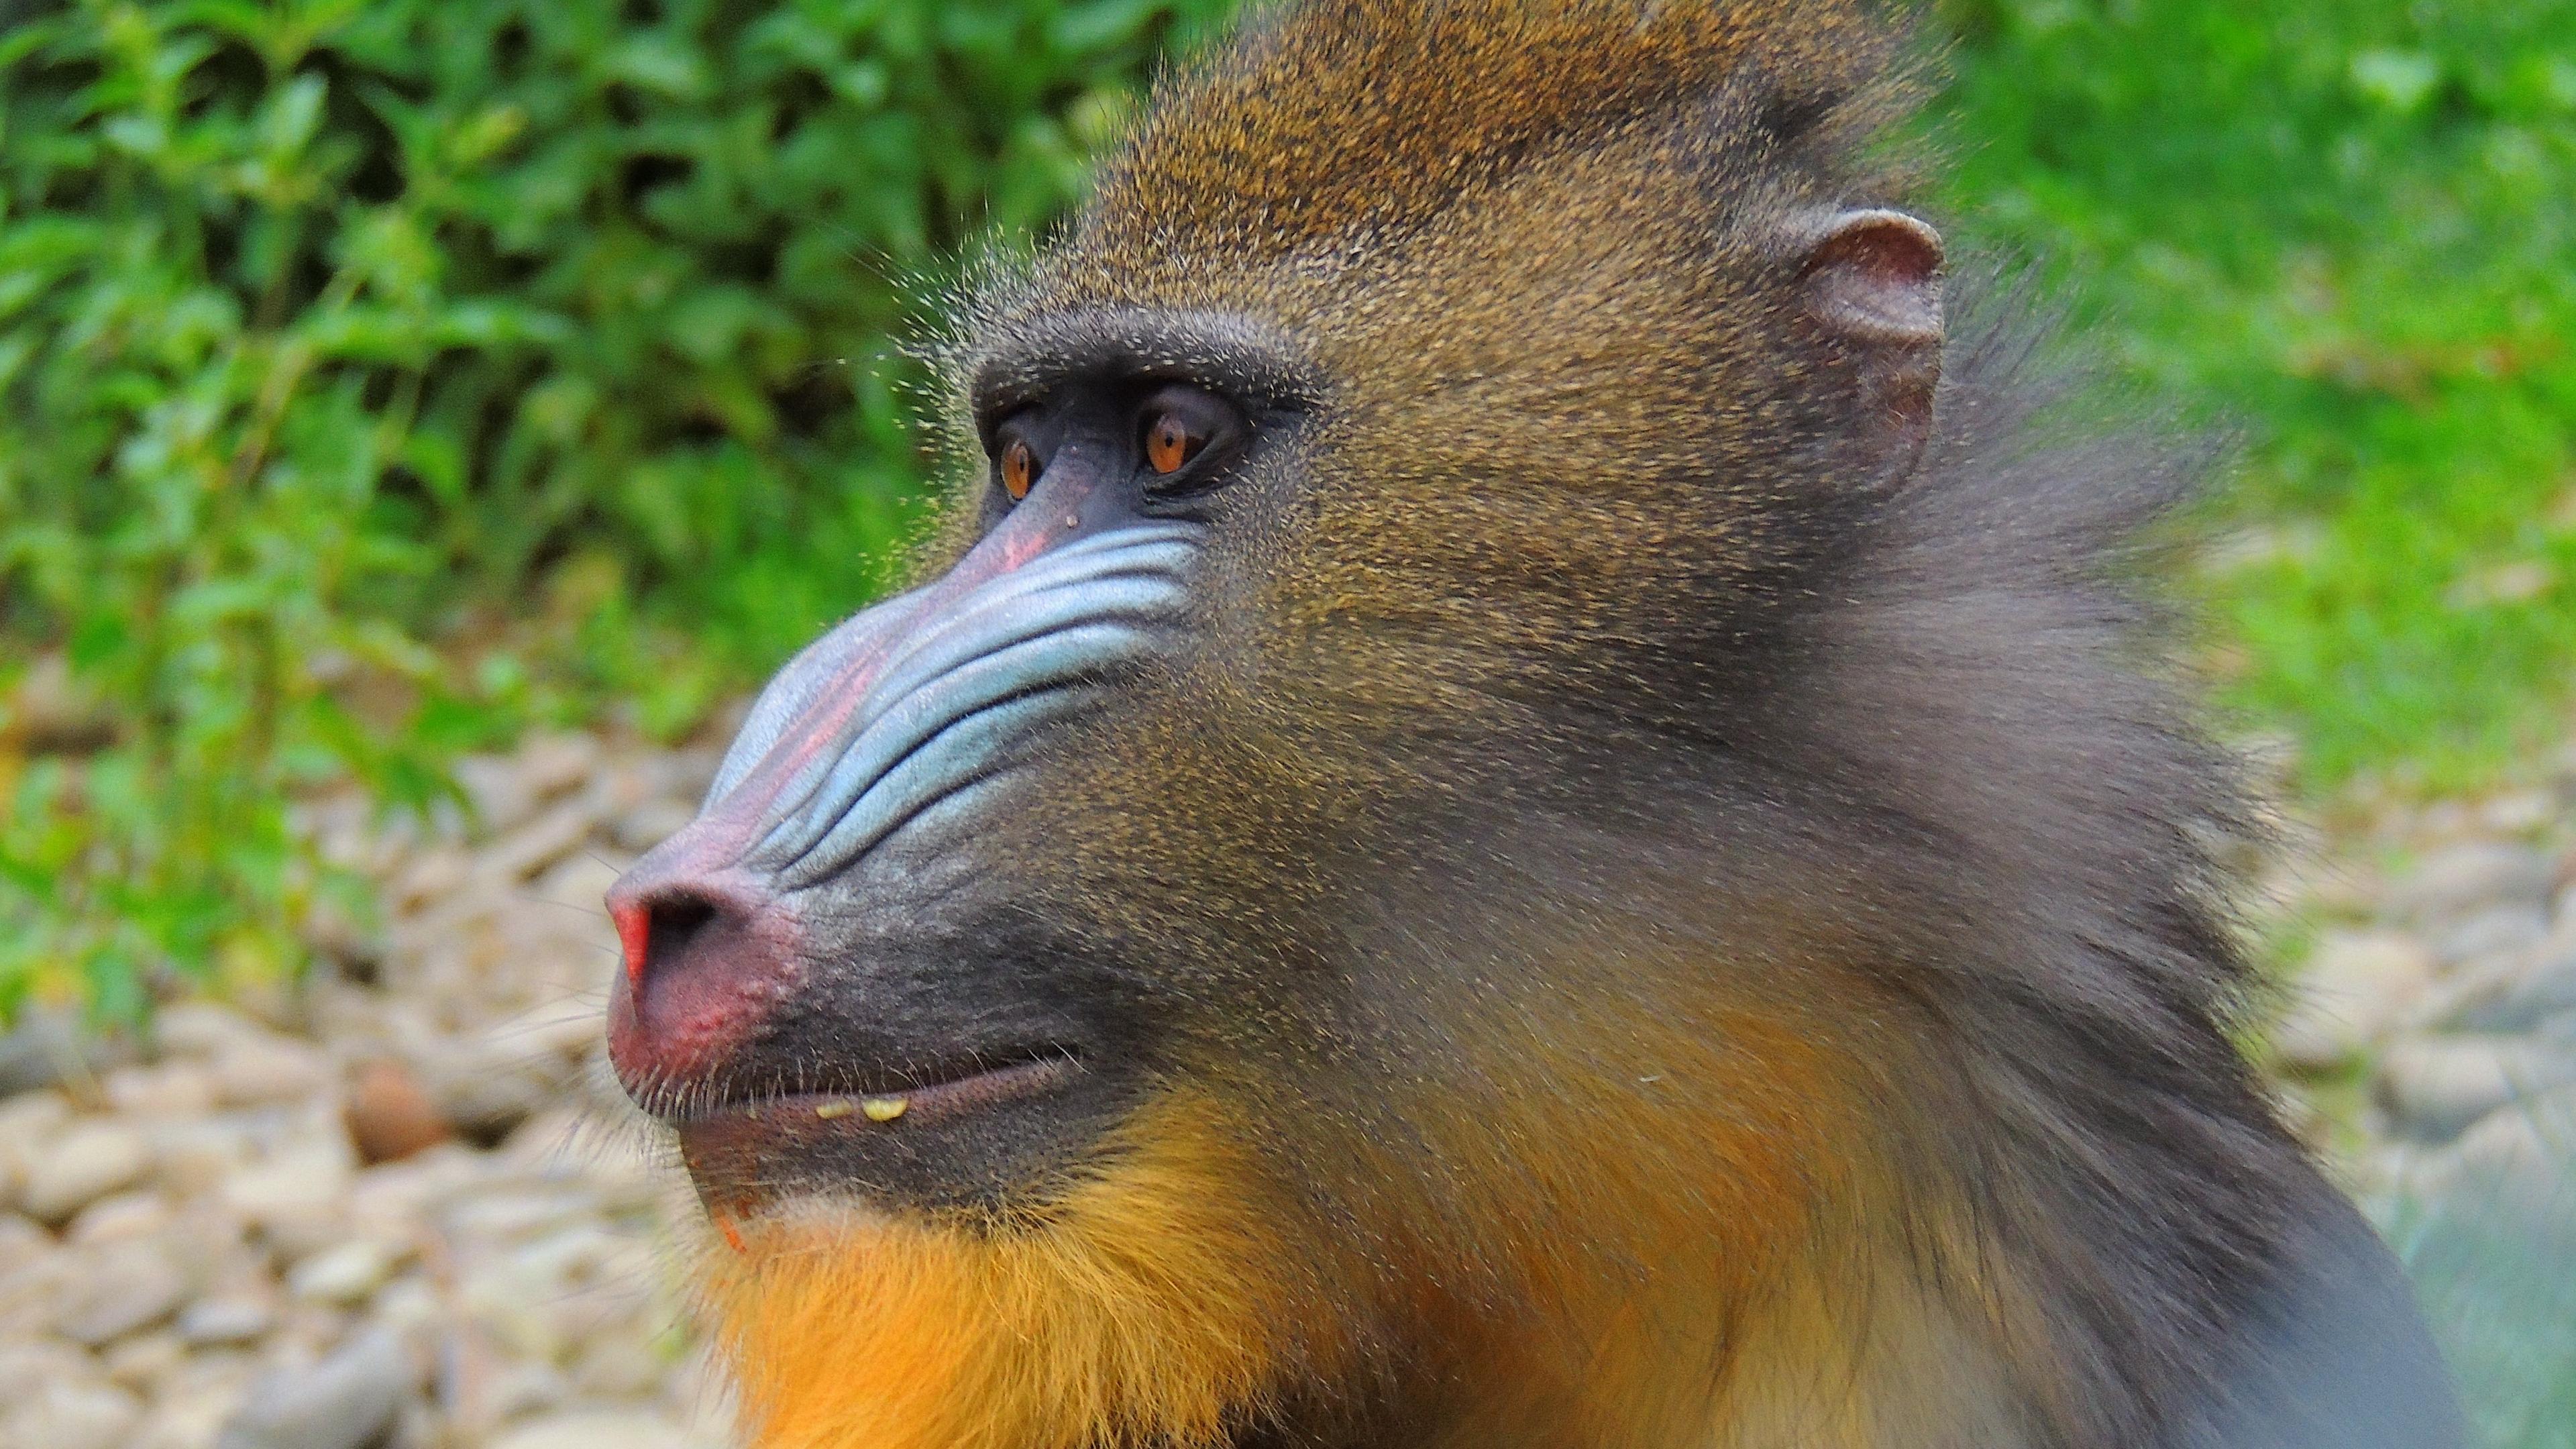 mandrill monkey muzzle fur 4k 1542242937 - mandrill, monkey, muzzle, fur 4k - muzzle, Monkey, mandrill